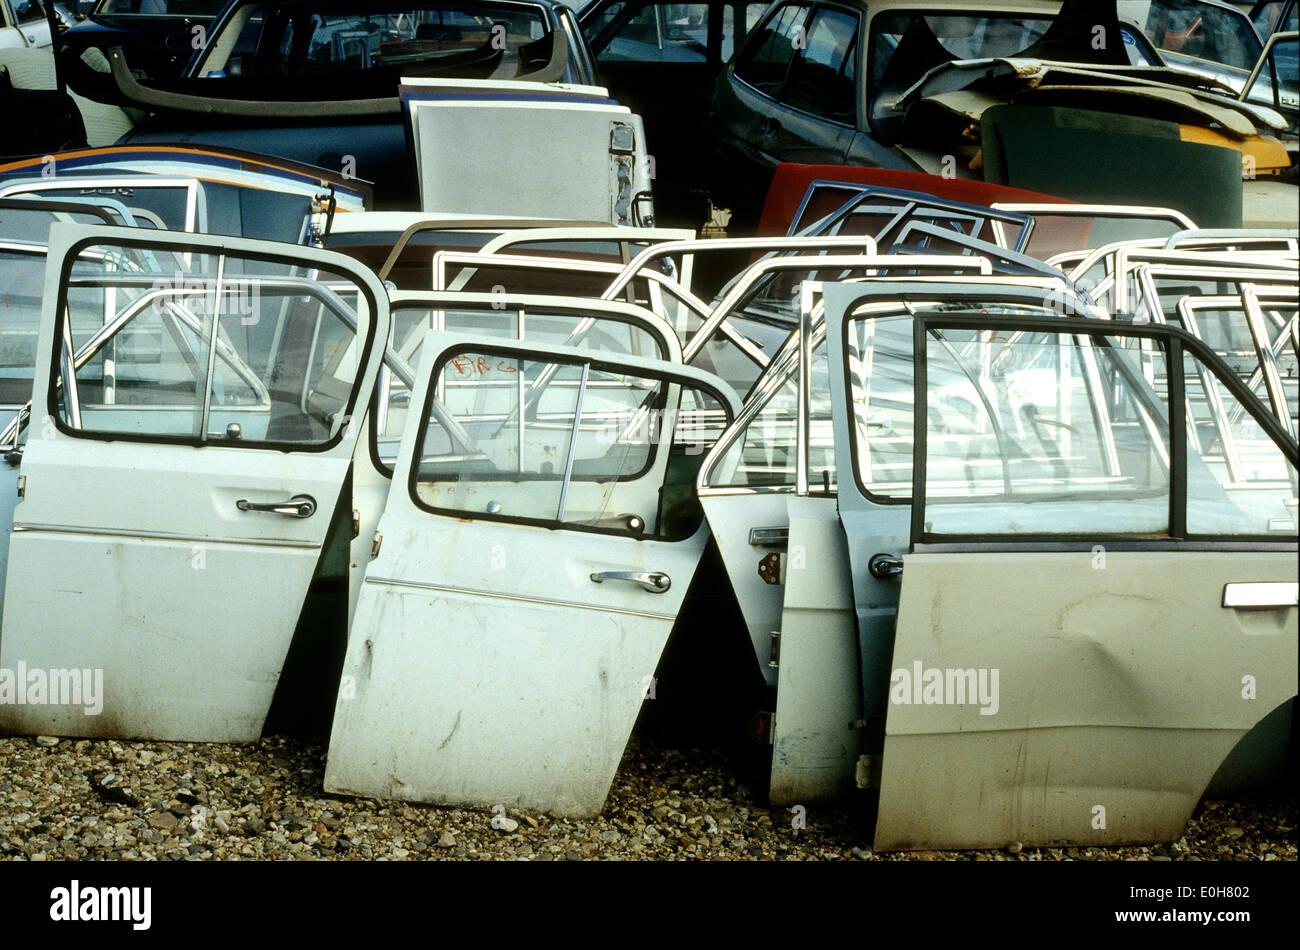 Old car doors at a scrap metal yard Stock Photo, Royalty Free ...